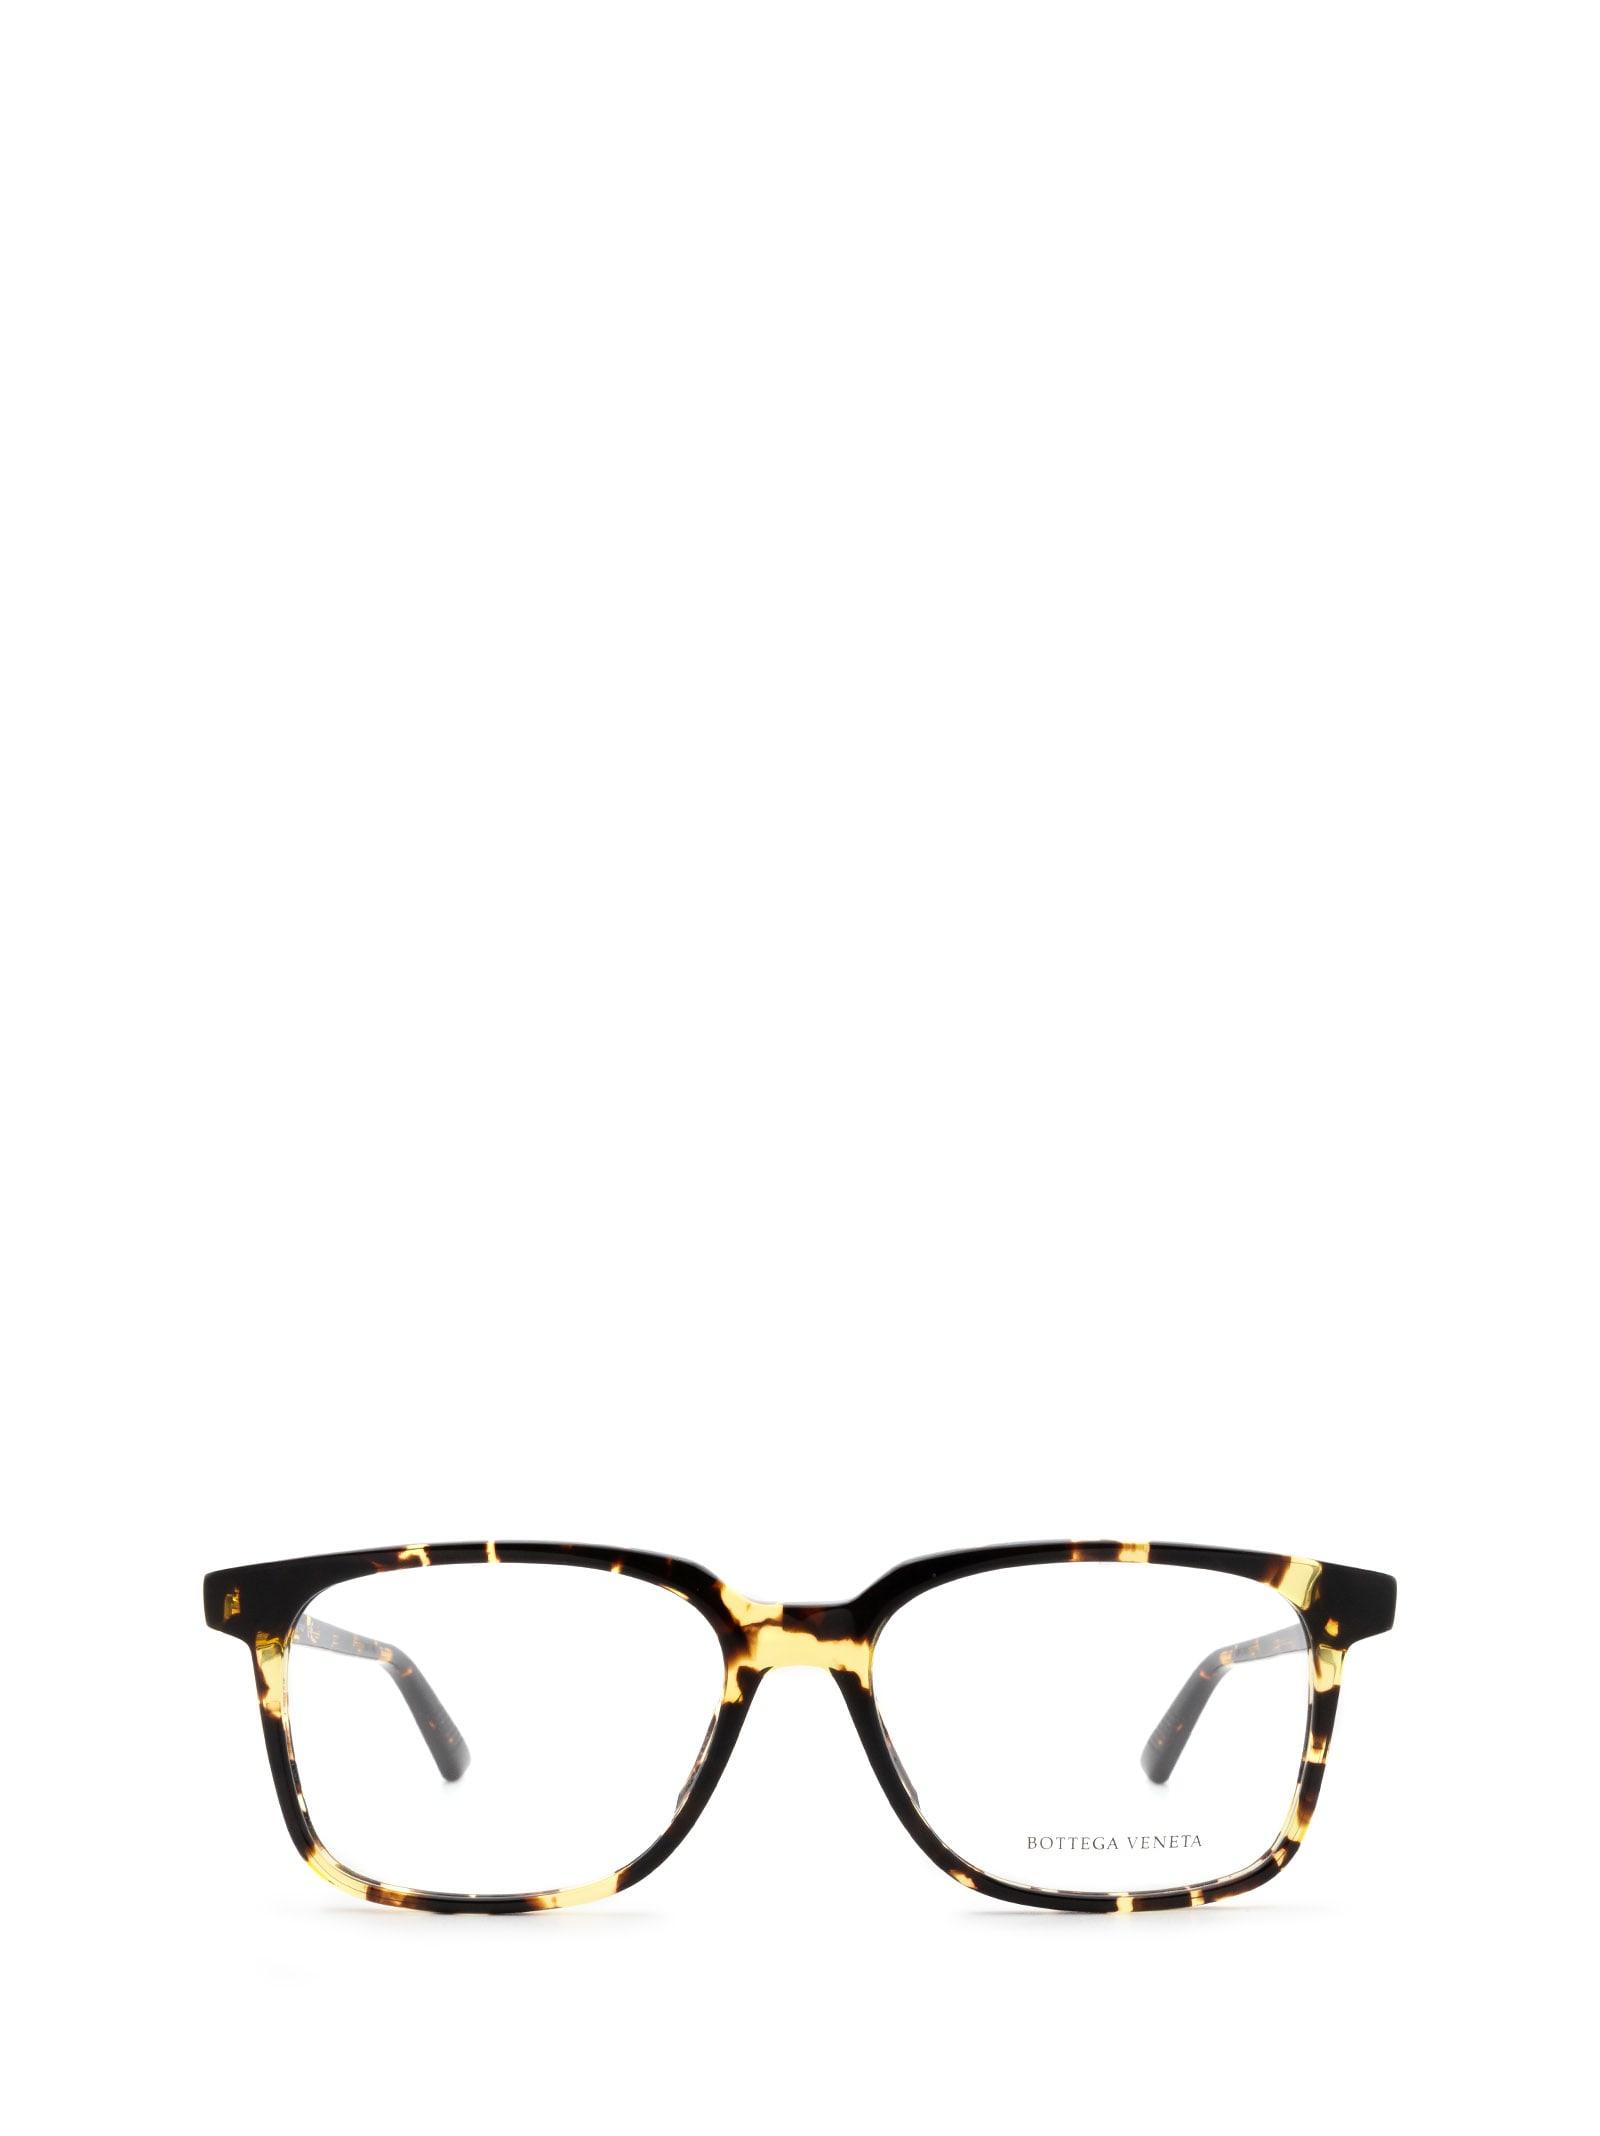 Bottega Veneta Bottega Veneta Bv1024o Havana Glasses